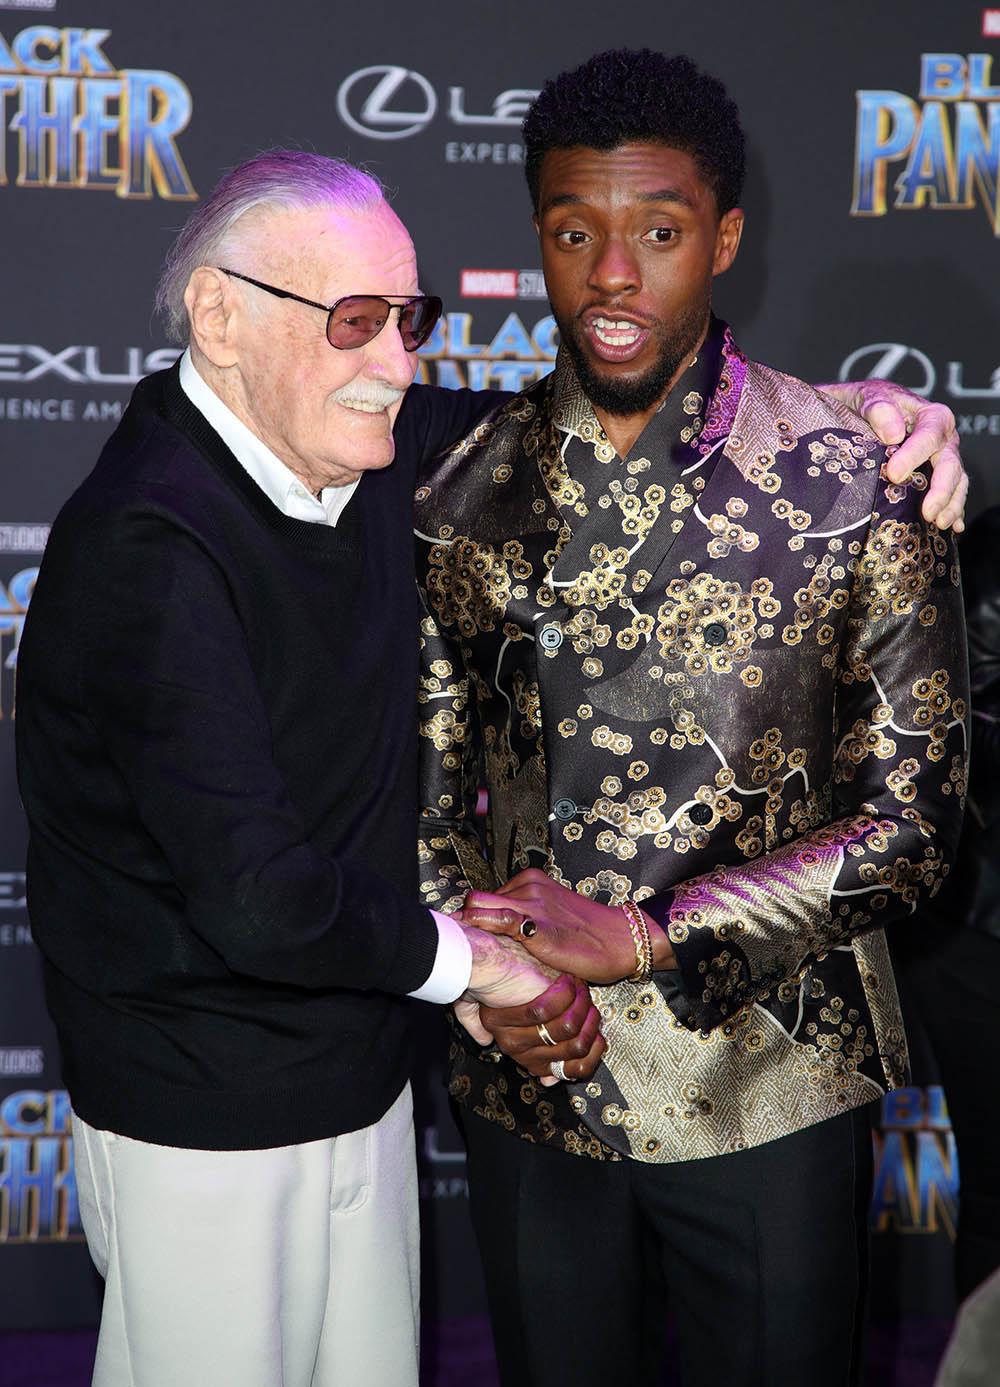 Stan Lee Chadwick Boseman At Film Premiere Of Black Panther Sandra Rose